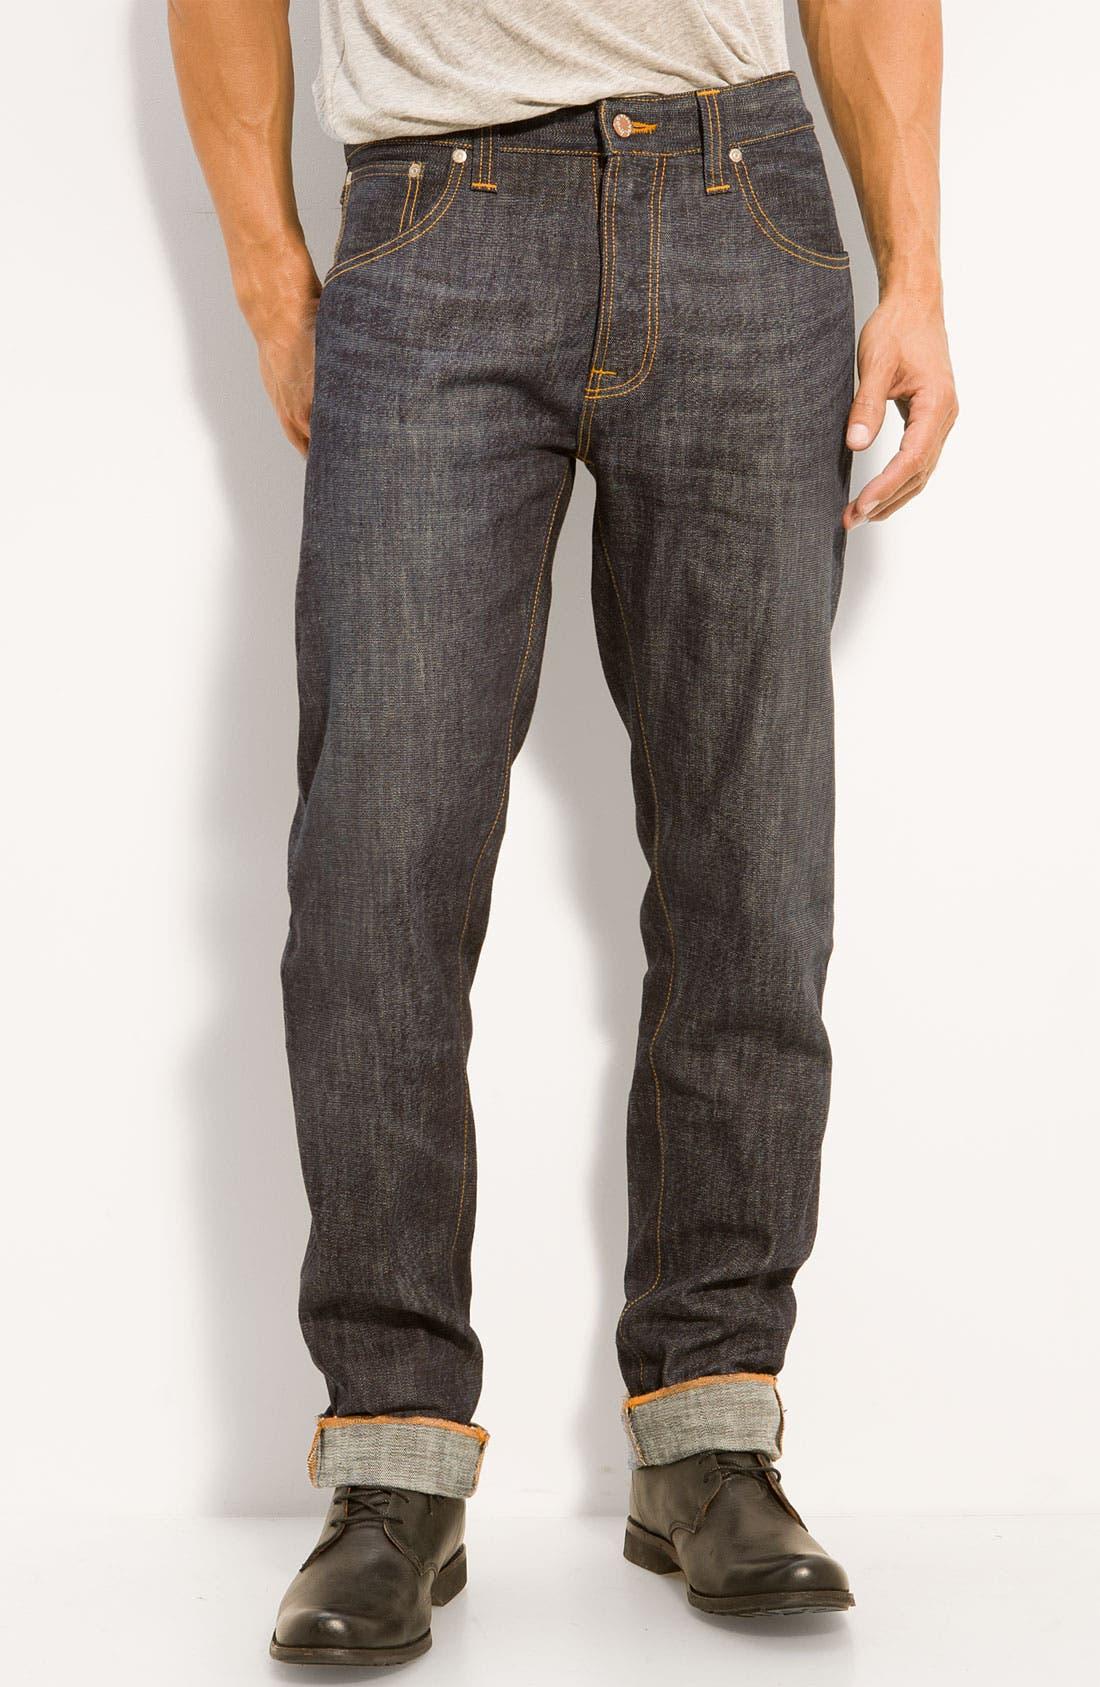 NUDIE JEANS,                             Nudie 'Sharp Bengt' Straight Leg Jeans,                             Alternate thumbnail 2, color,                             400